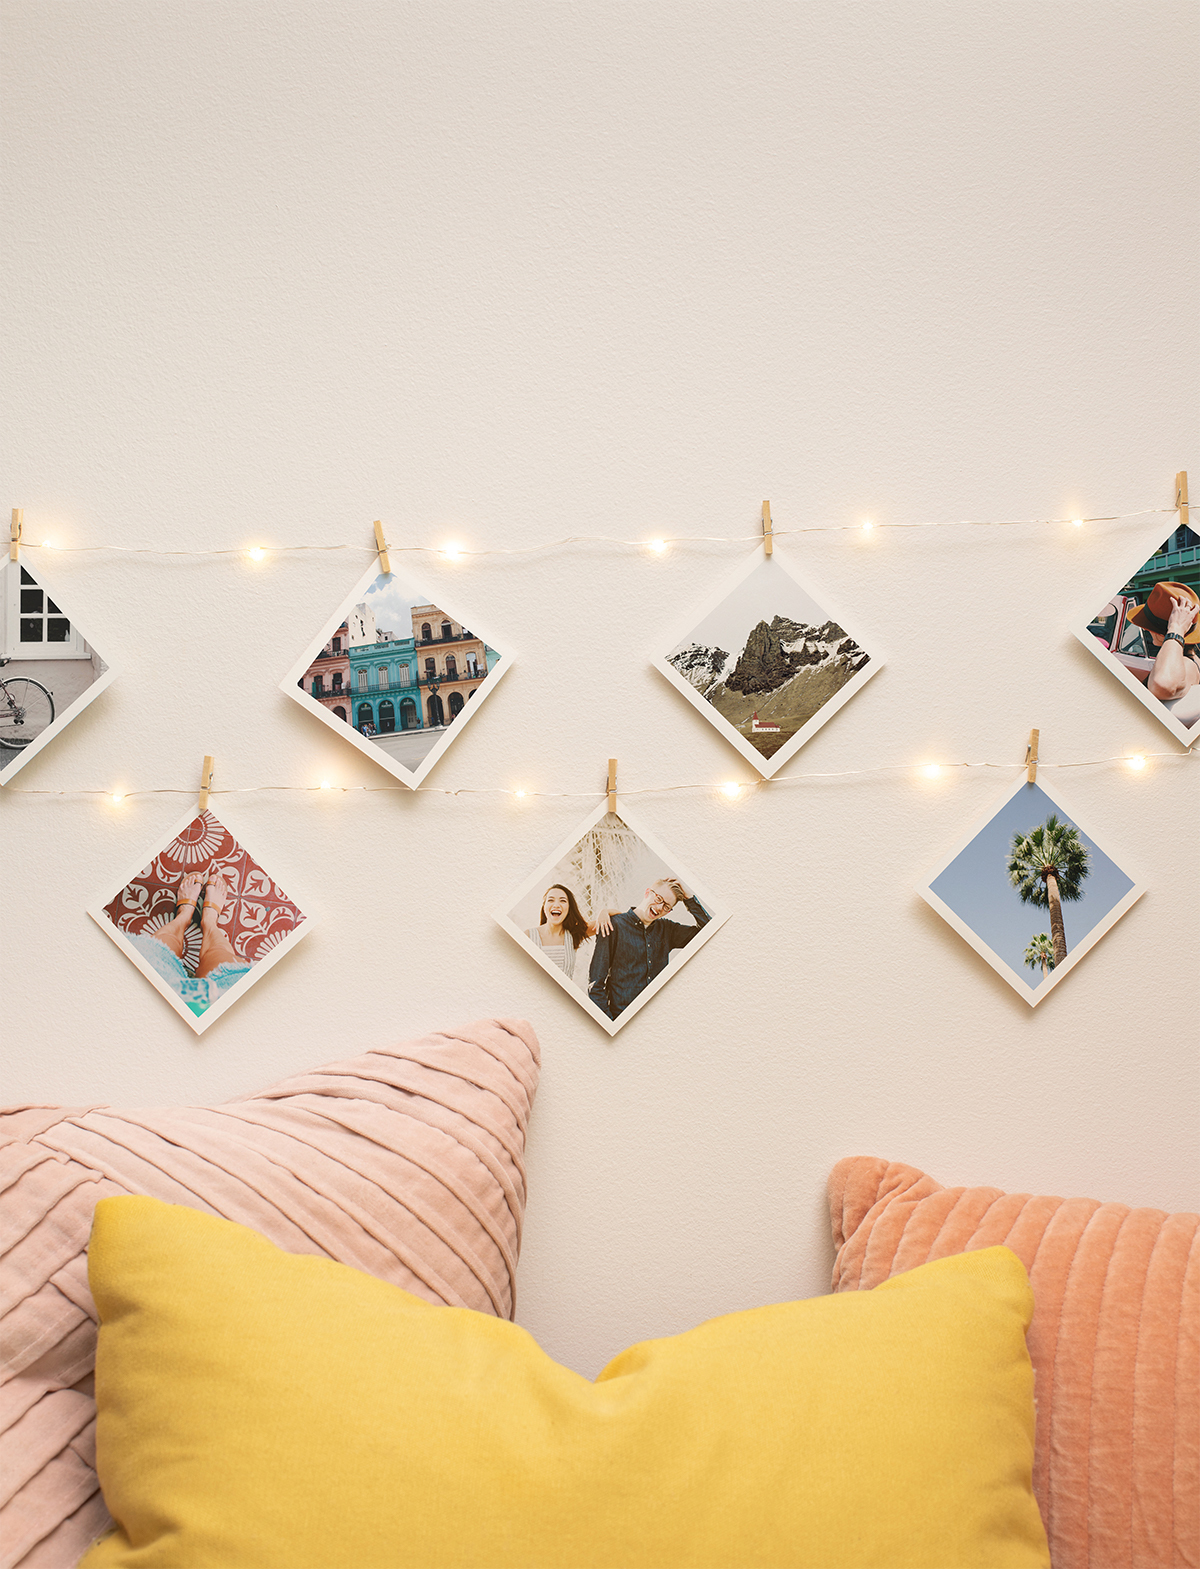 Artifact Uprising photo prints hanging from LED string lights